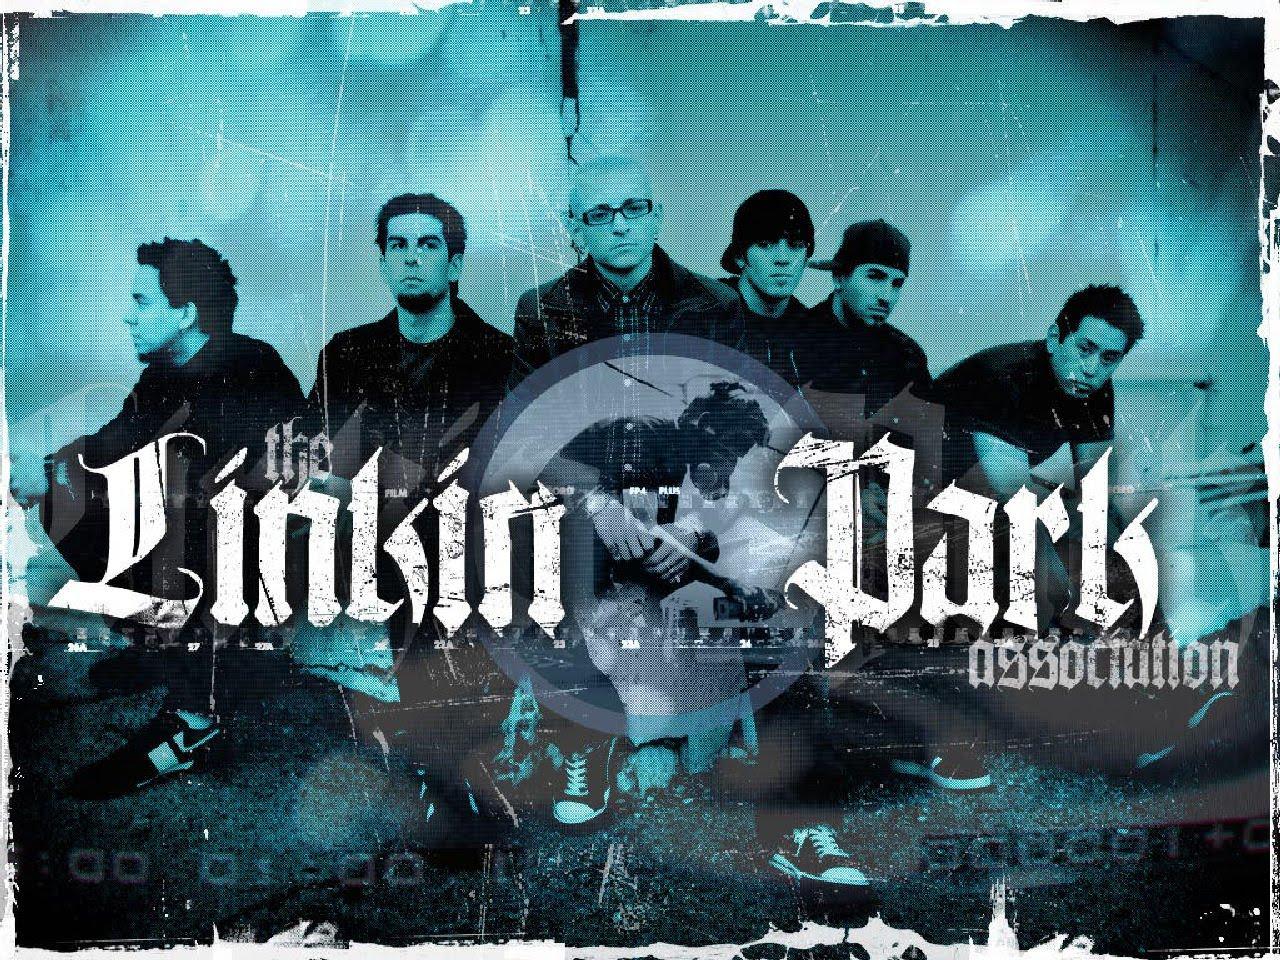 http://2.bp.blogspot.com/_1rzWcrjfNJY/TQmyMU8RYHI/AAAAAAAAAEA/zIPWrAvOSTw/s1600/Linkin-Park-Wallpaper.jpg